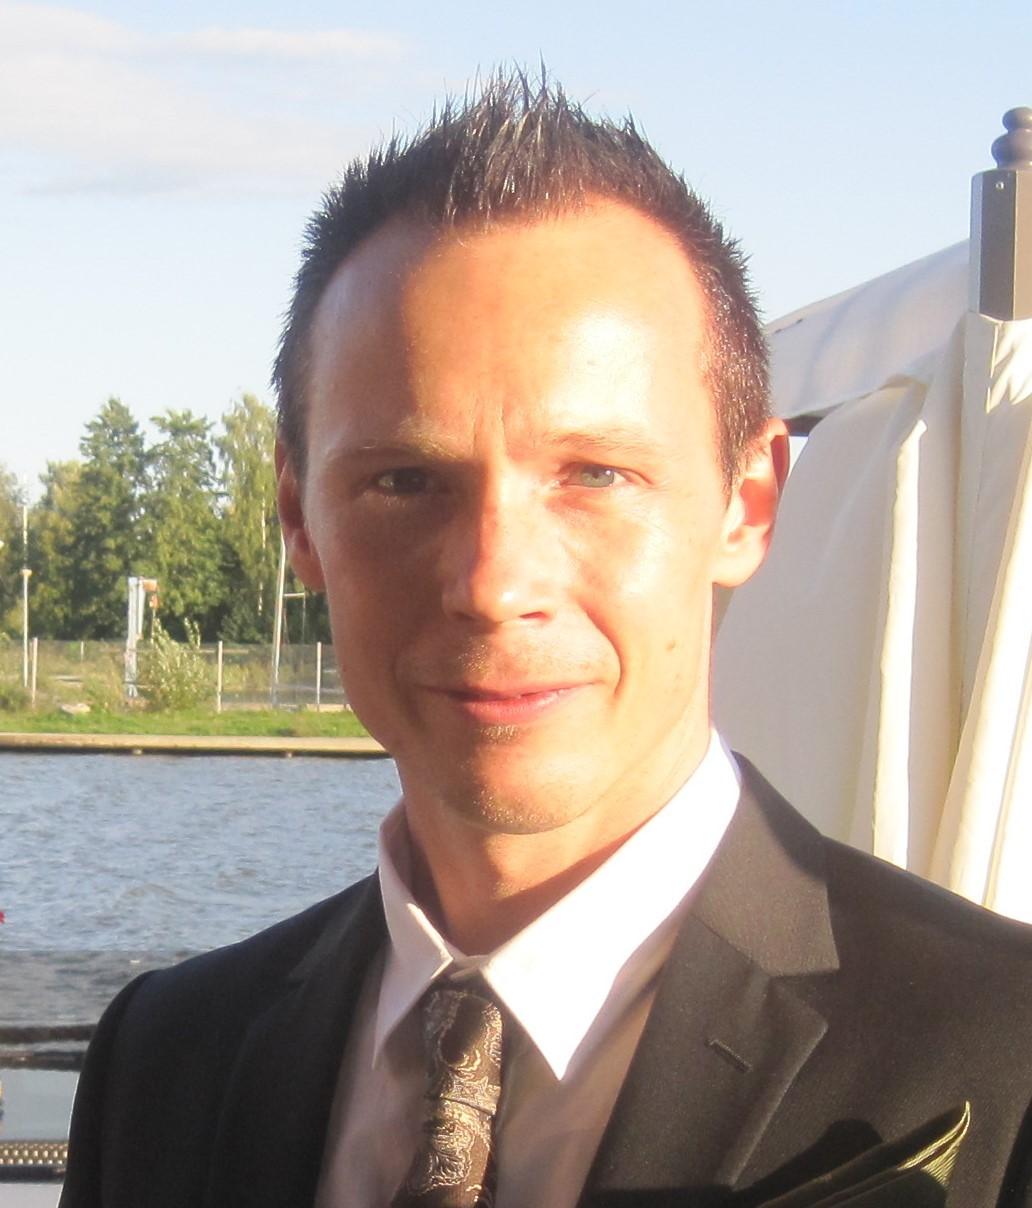 Magnus Larsson-Auna : Kund och Logistikchef i Sverige